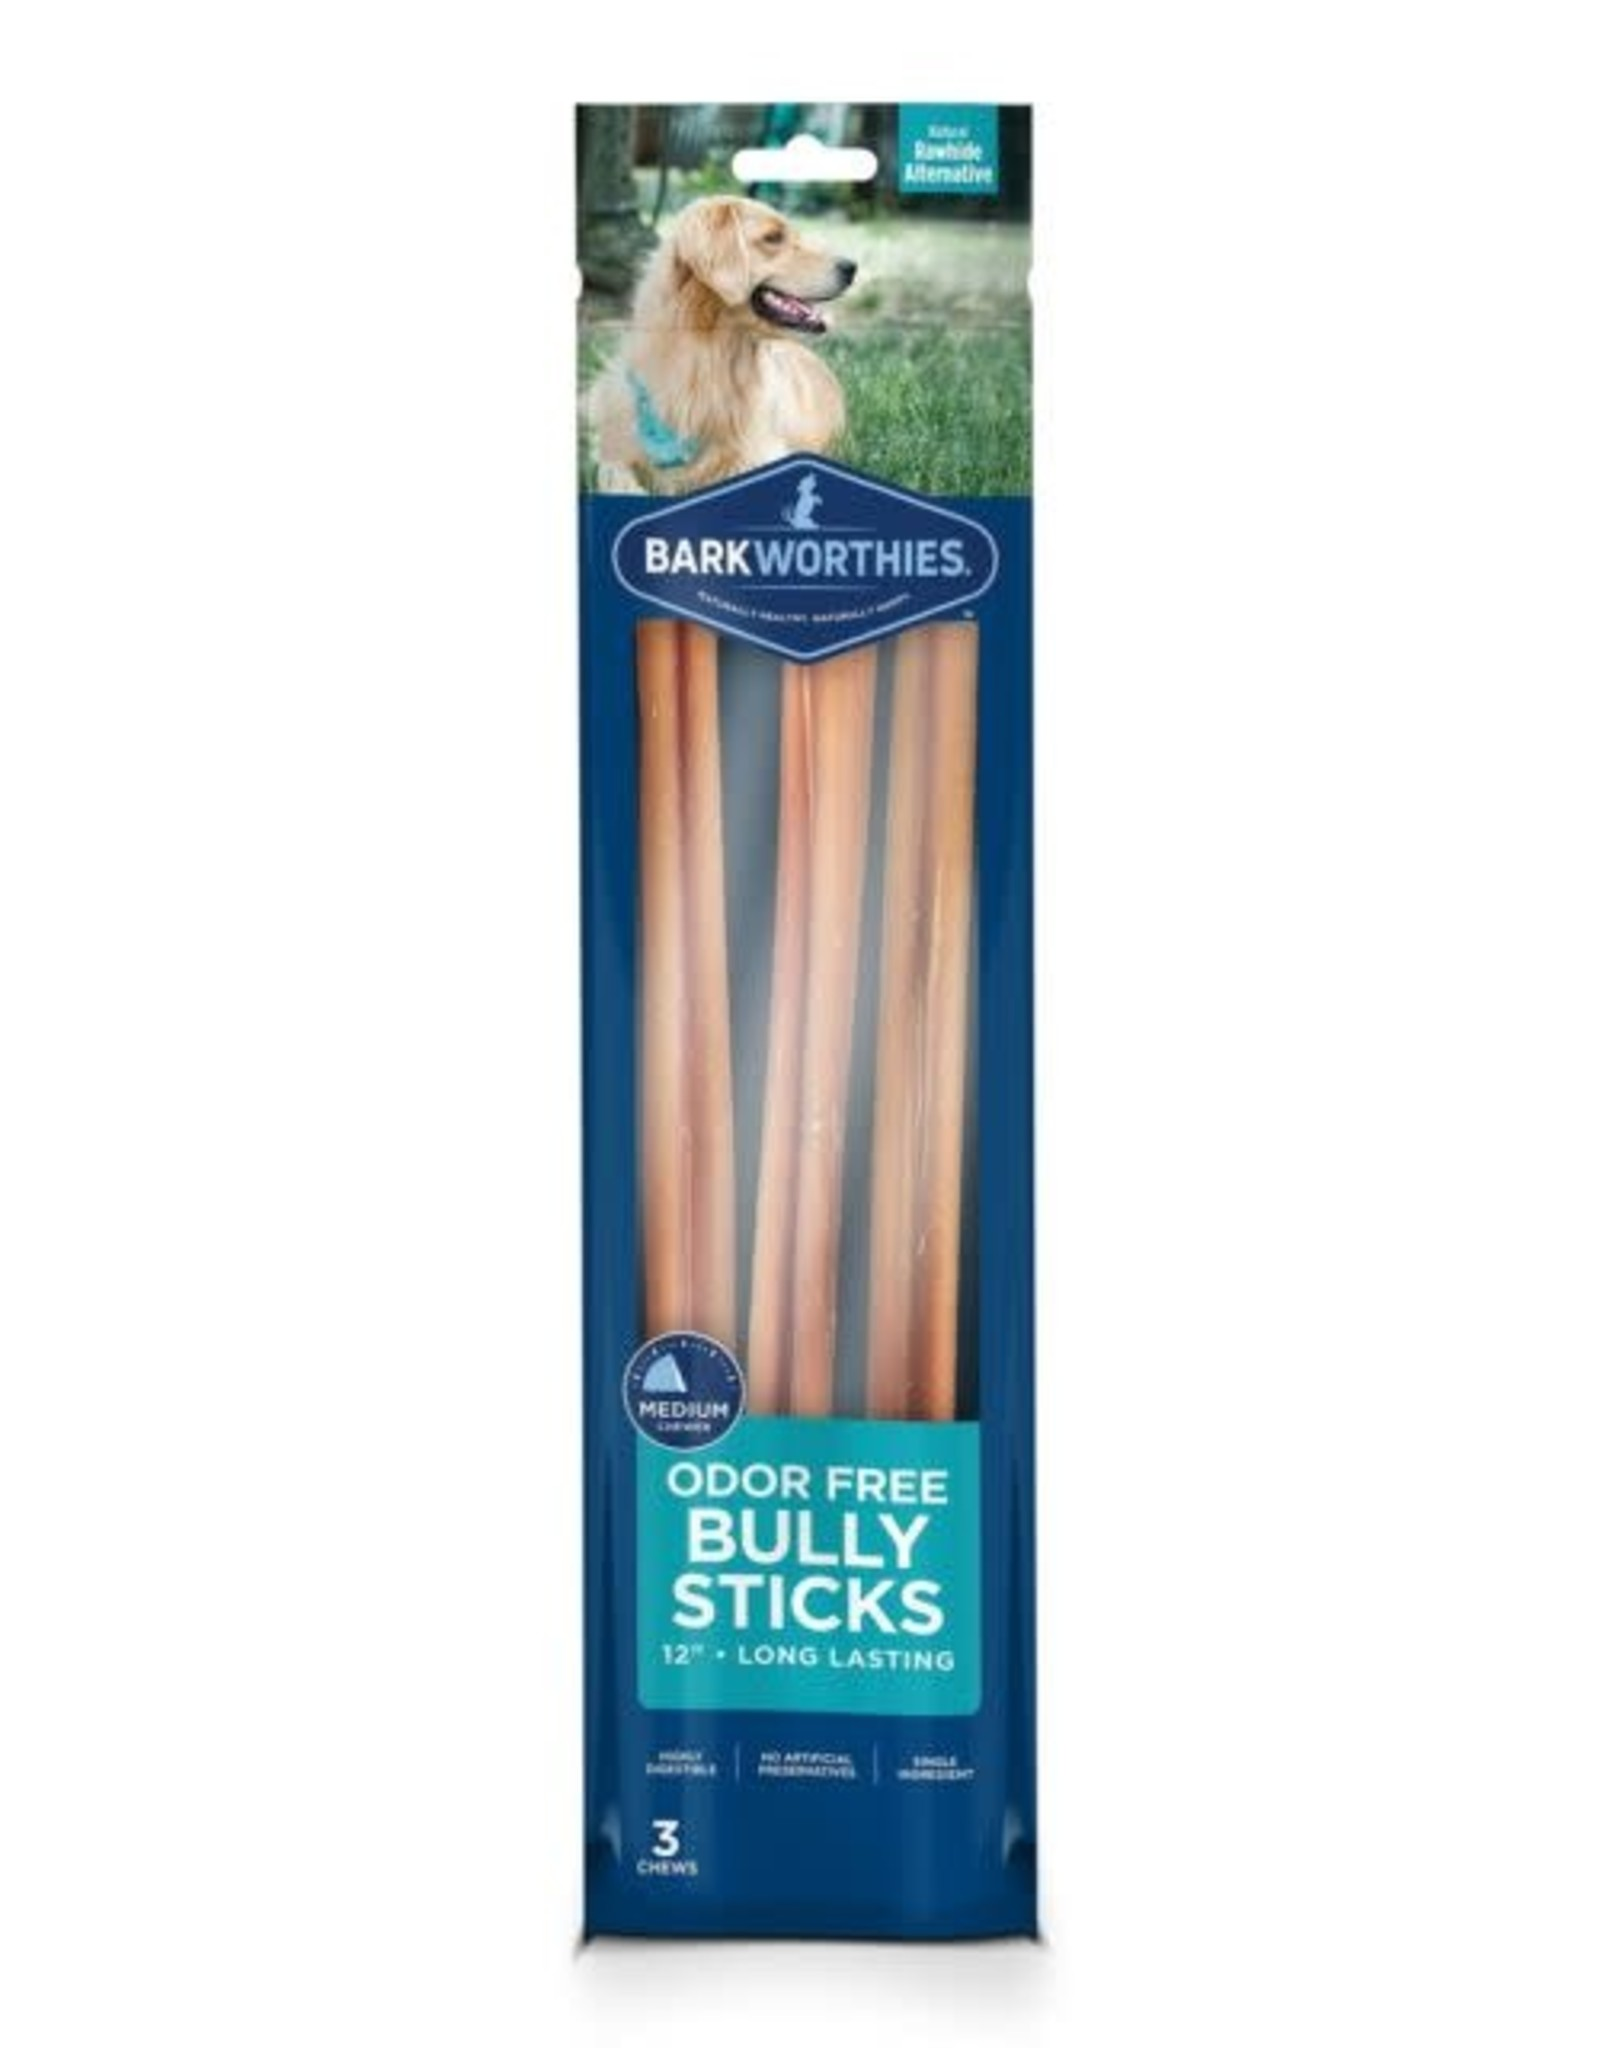 Barkworthies Barkworthies Odor Free Bully Sticks 12 3 pack